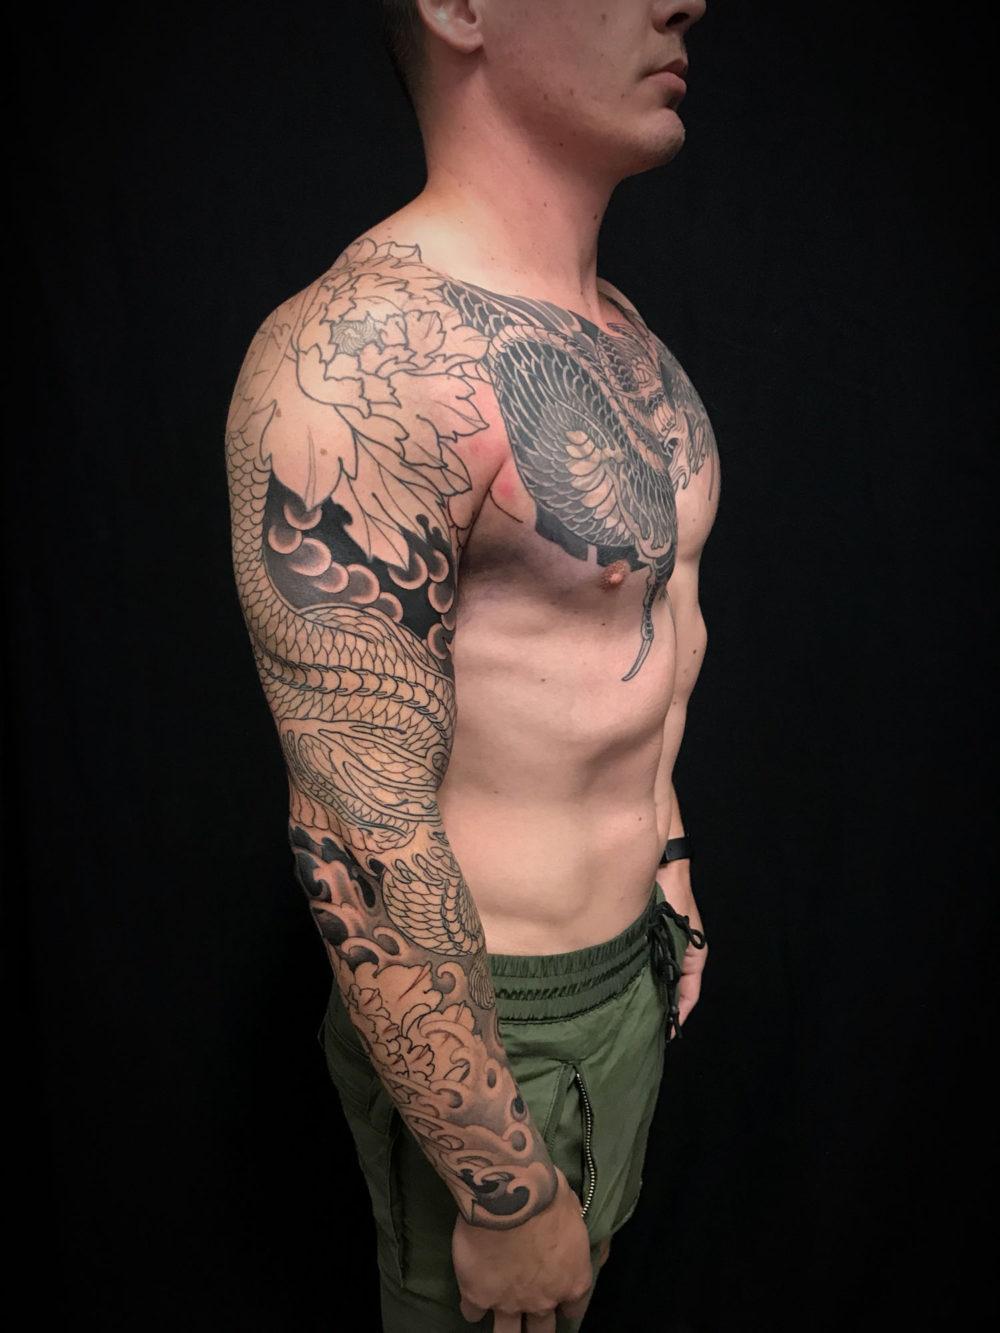 WIP Sleeve Tattoo